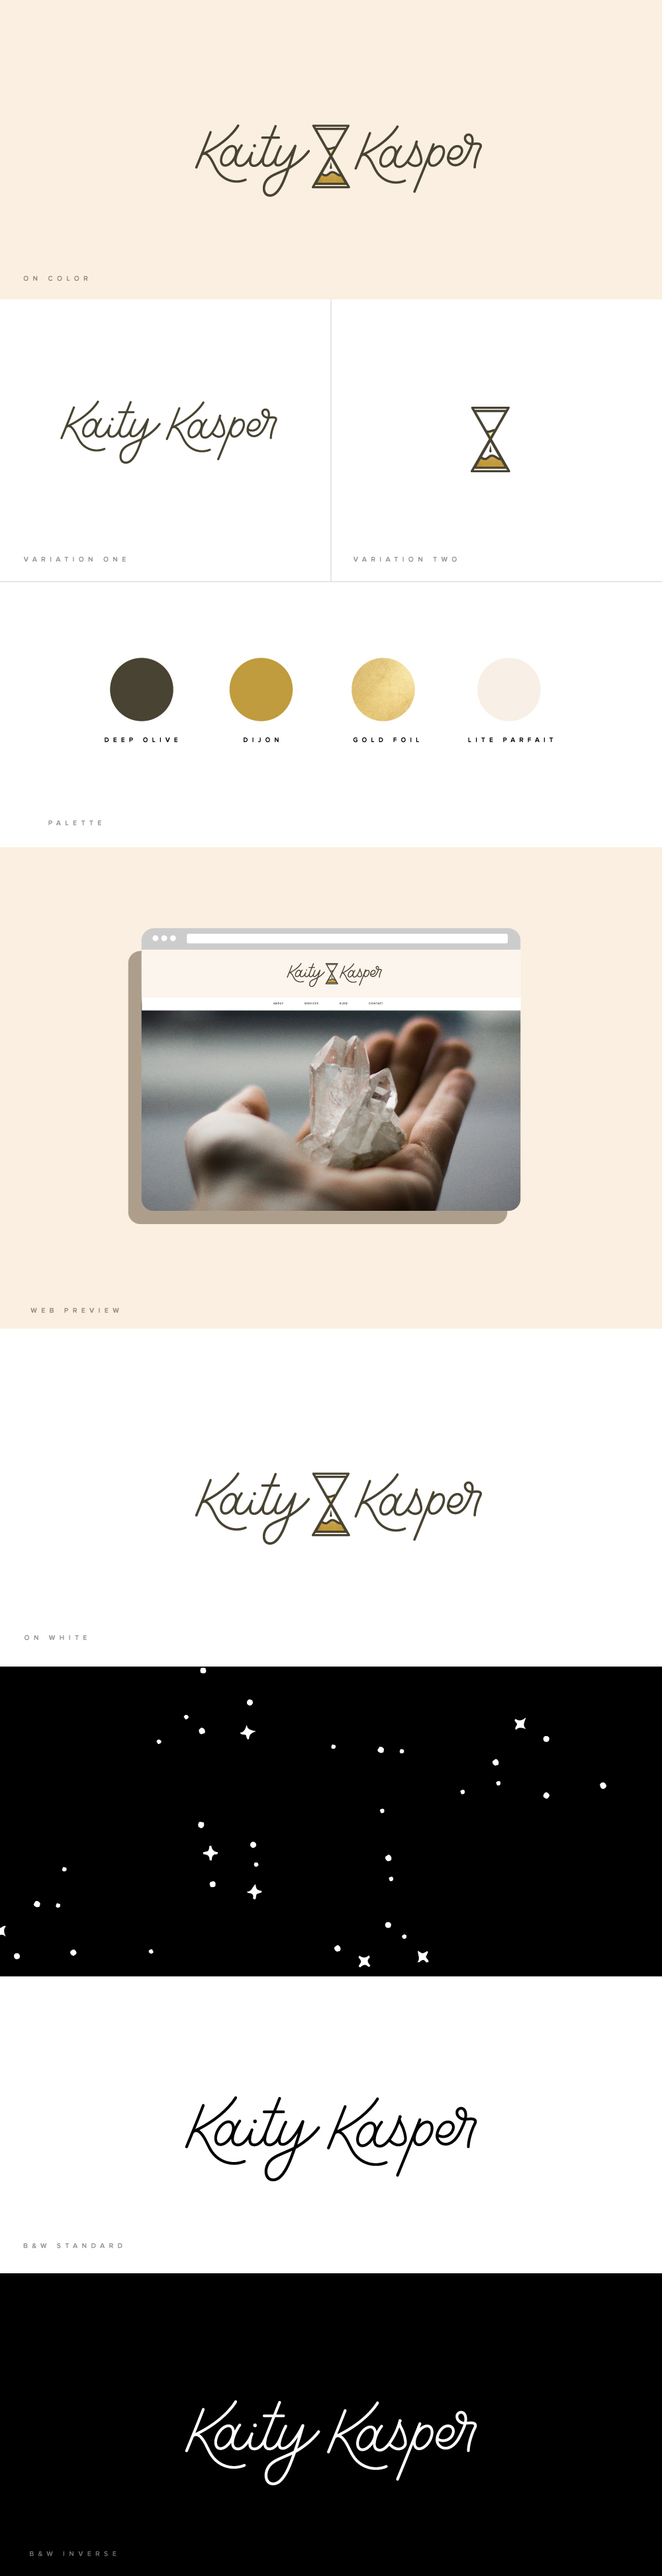 Kaity-Kasper-Revision-1.2.jpg